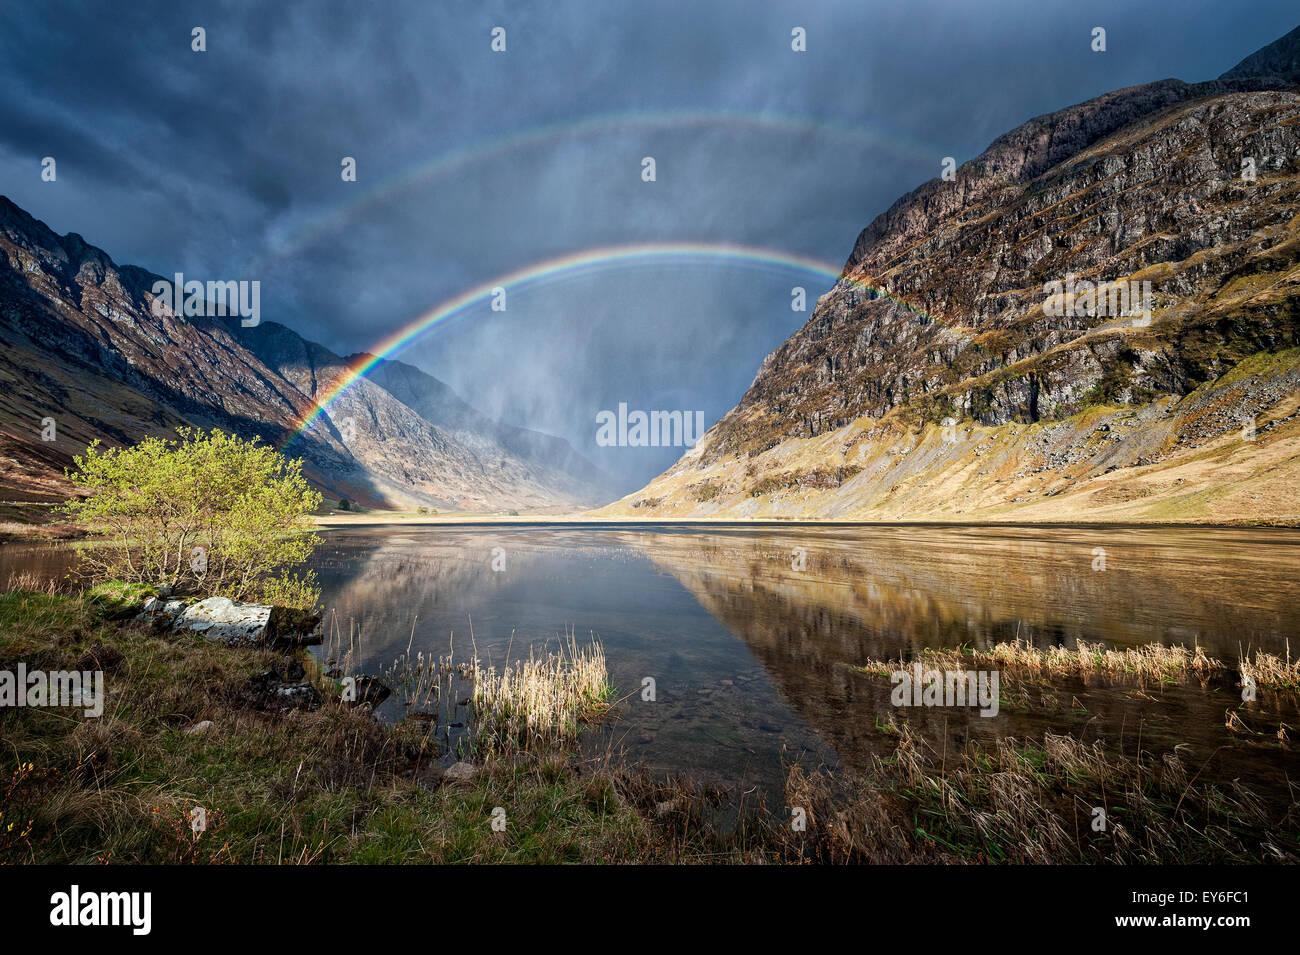 Paesaggio, paesaggi, Scozia, Scozzese Immagini Stock